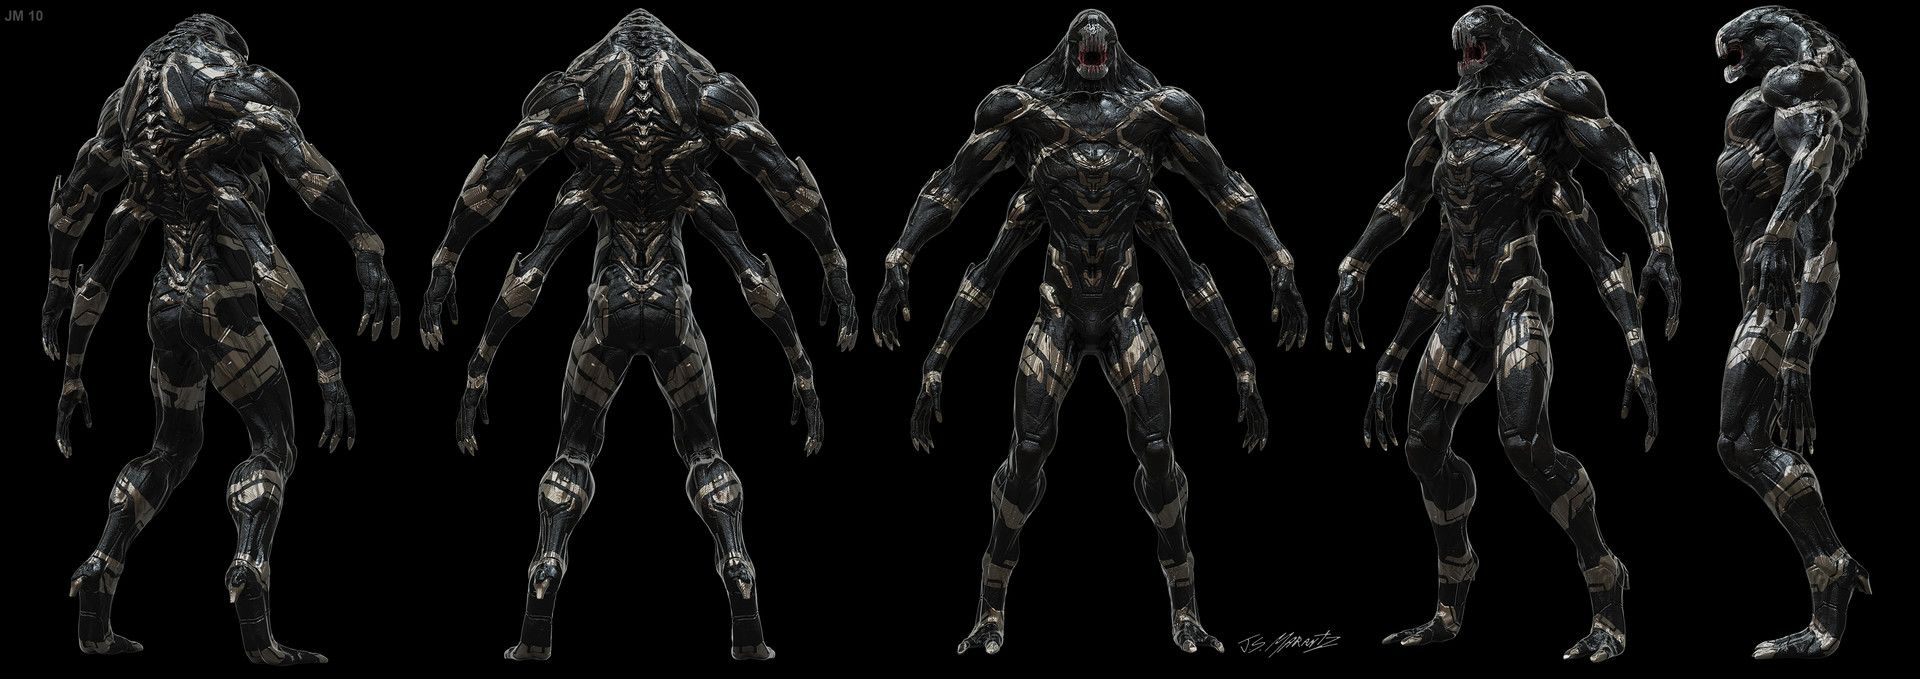 ArtStation - Avengers Infinity War: Outriders Designs, Jerad